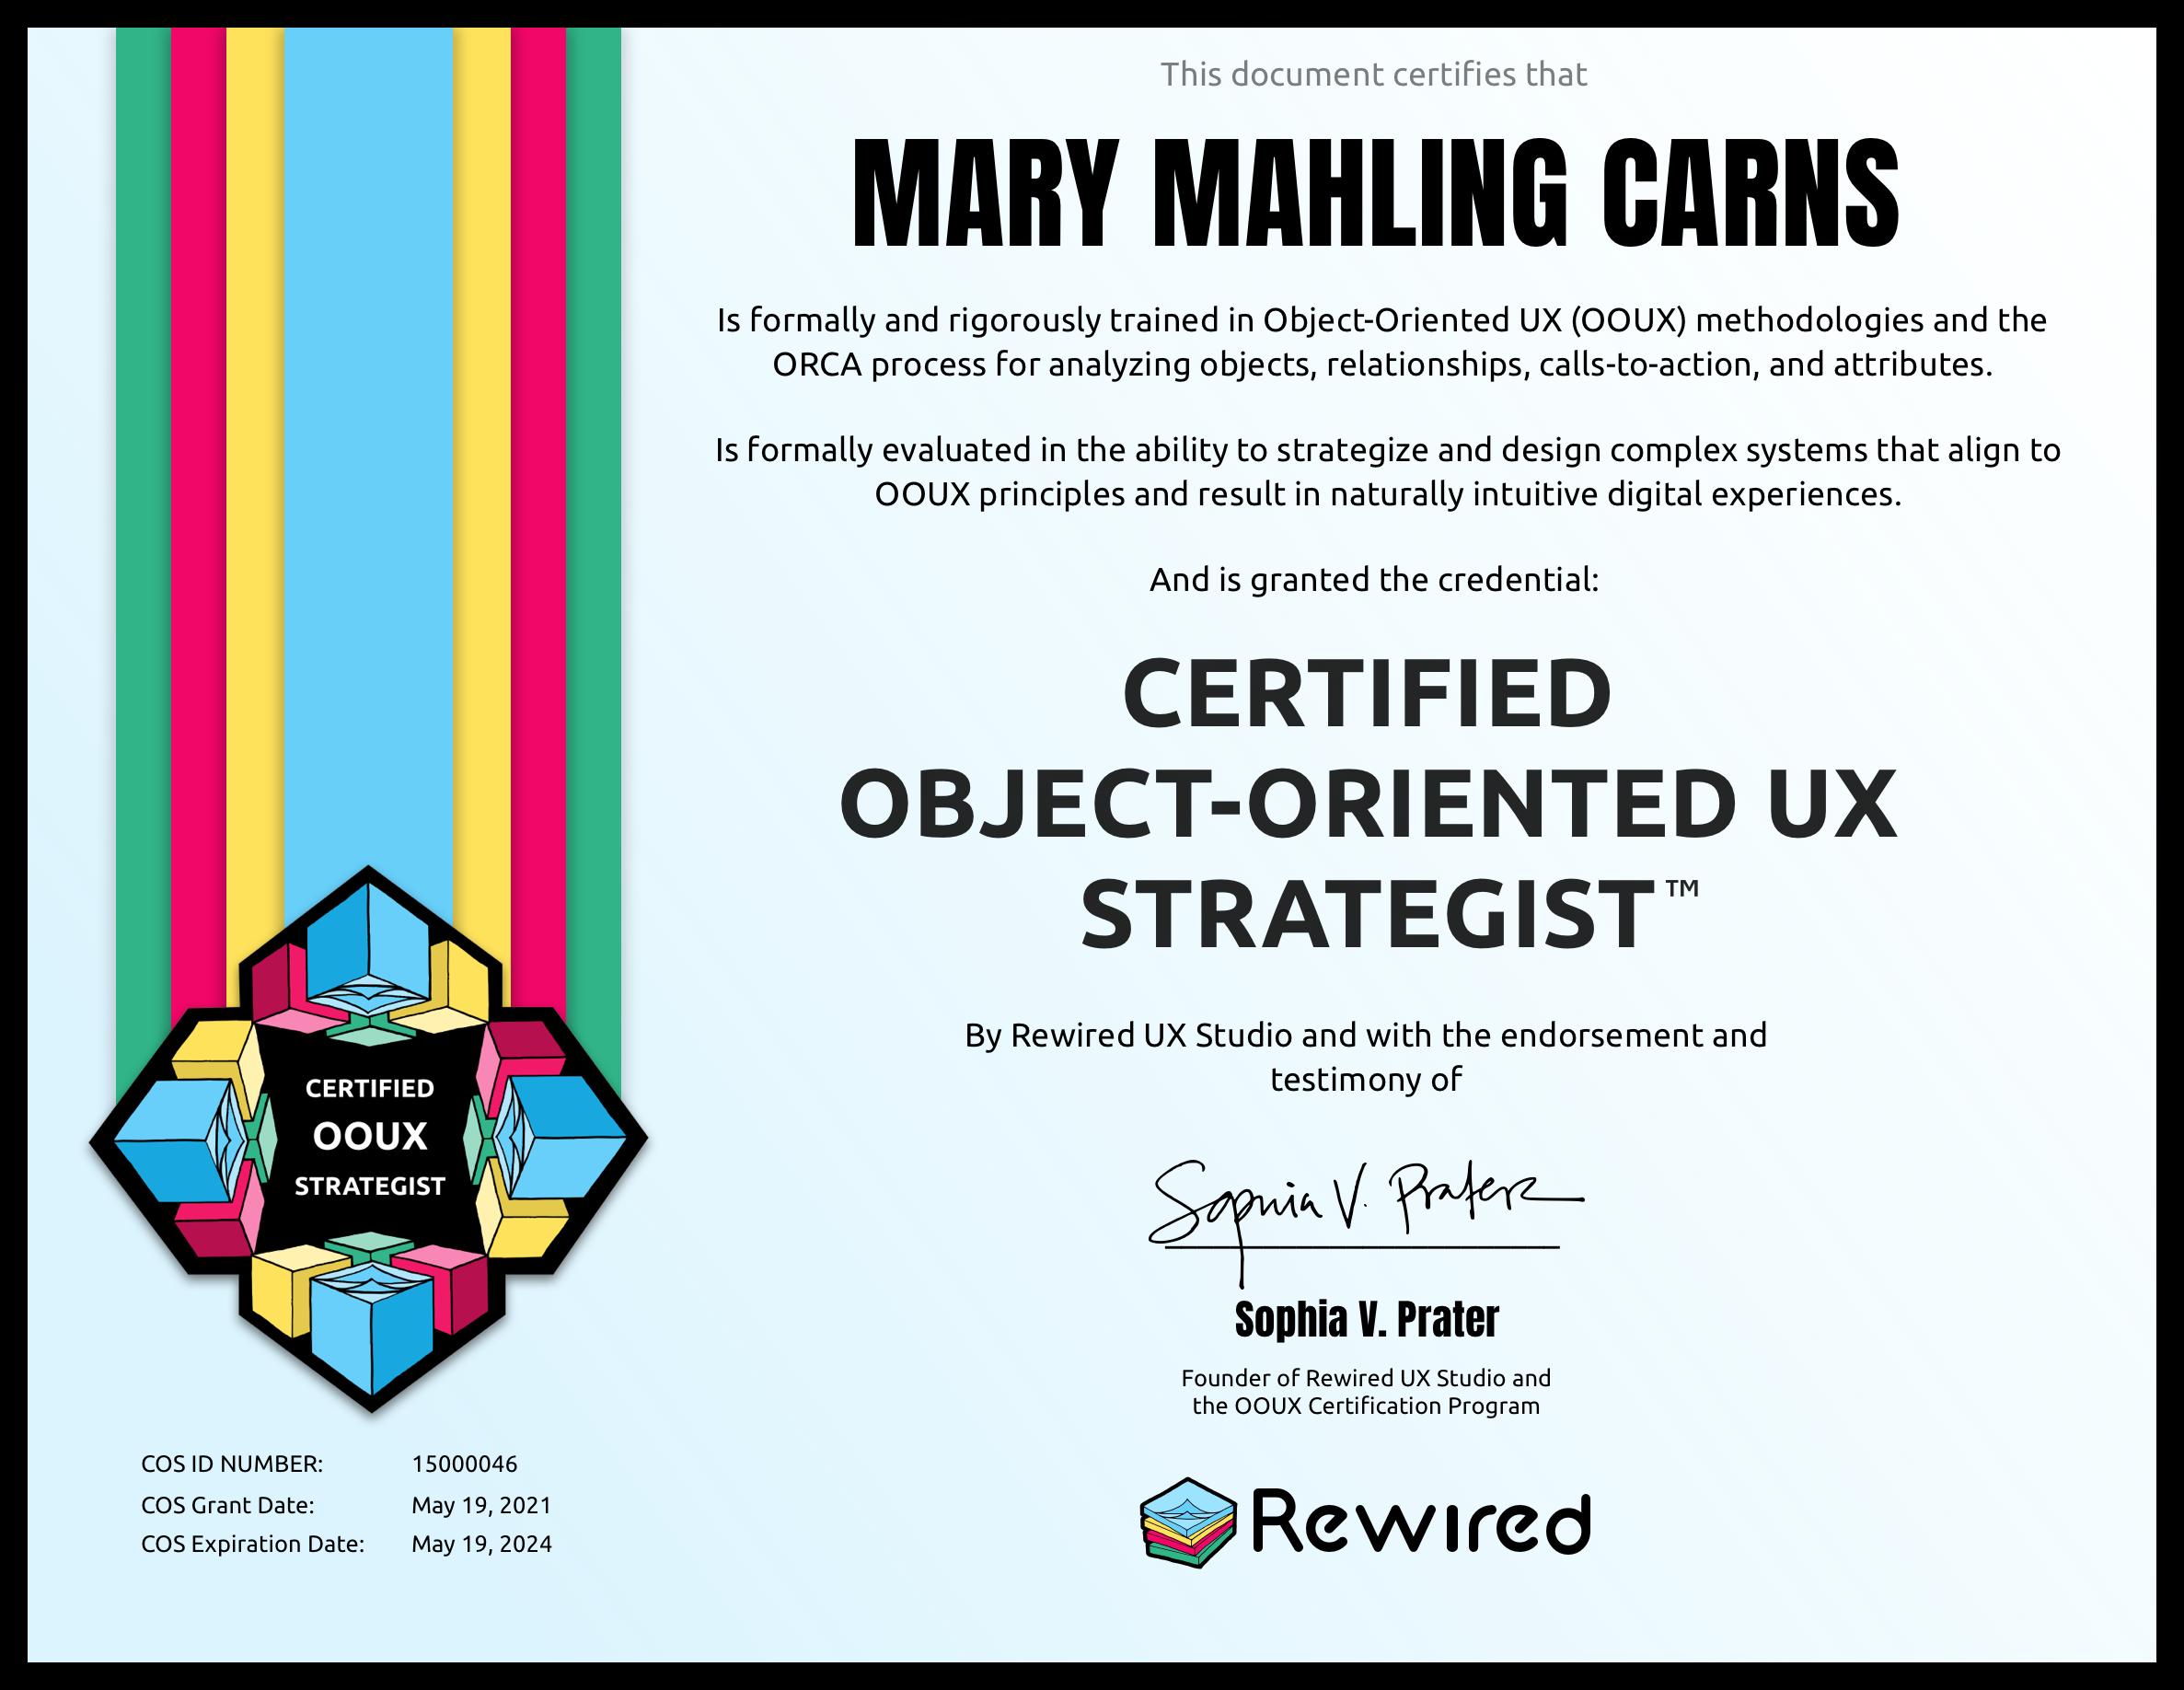 Mary Mahling Carns